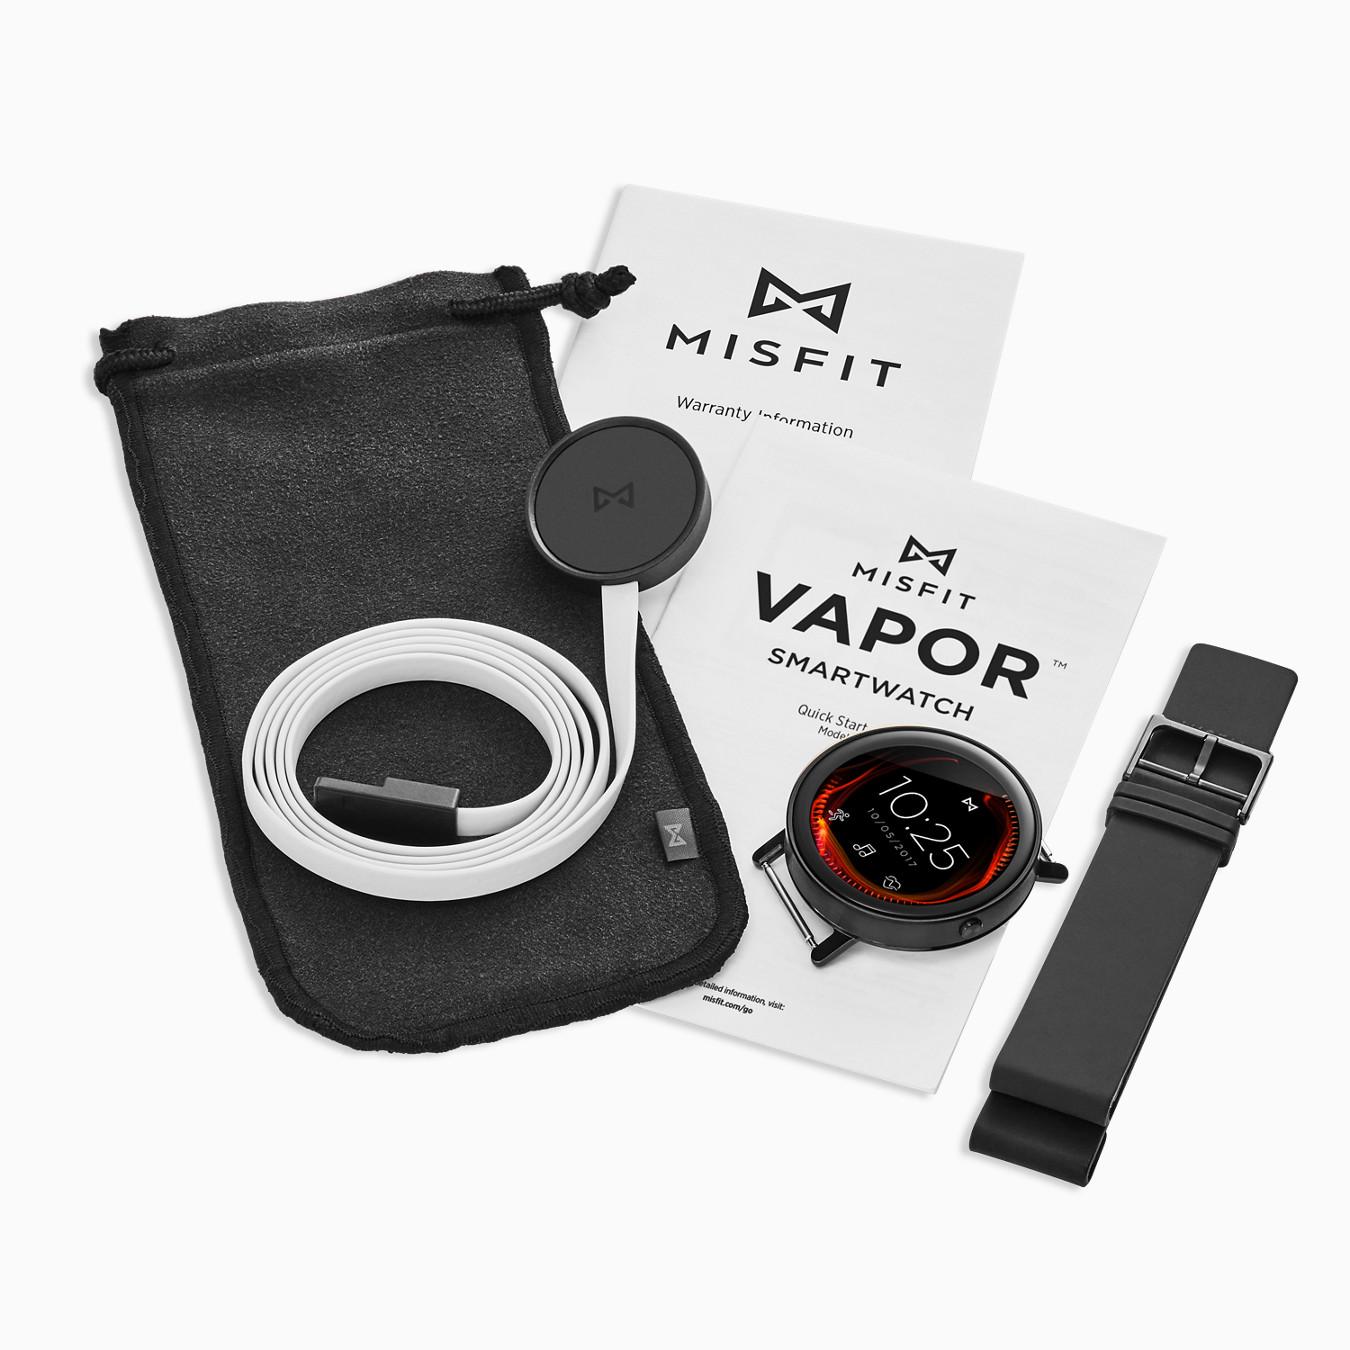 2 of 4  sc 1 st  Misfit & Misfit Vapor Smartwatch - Misfit